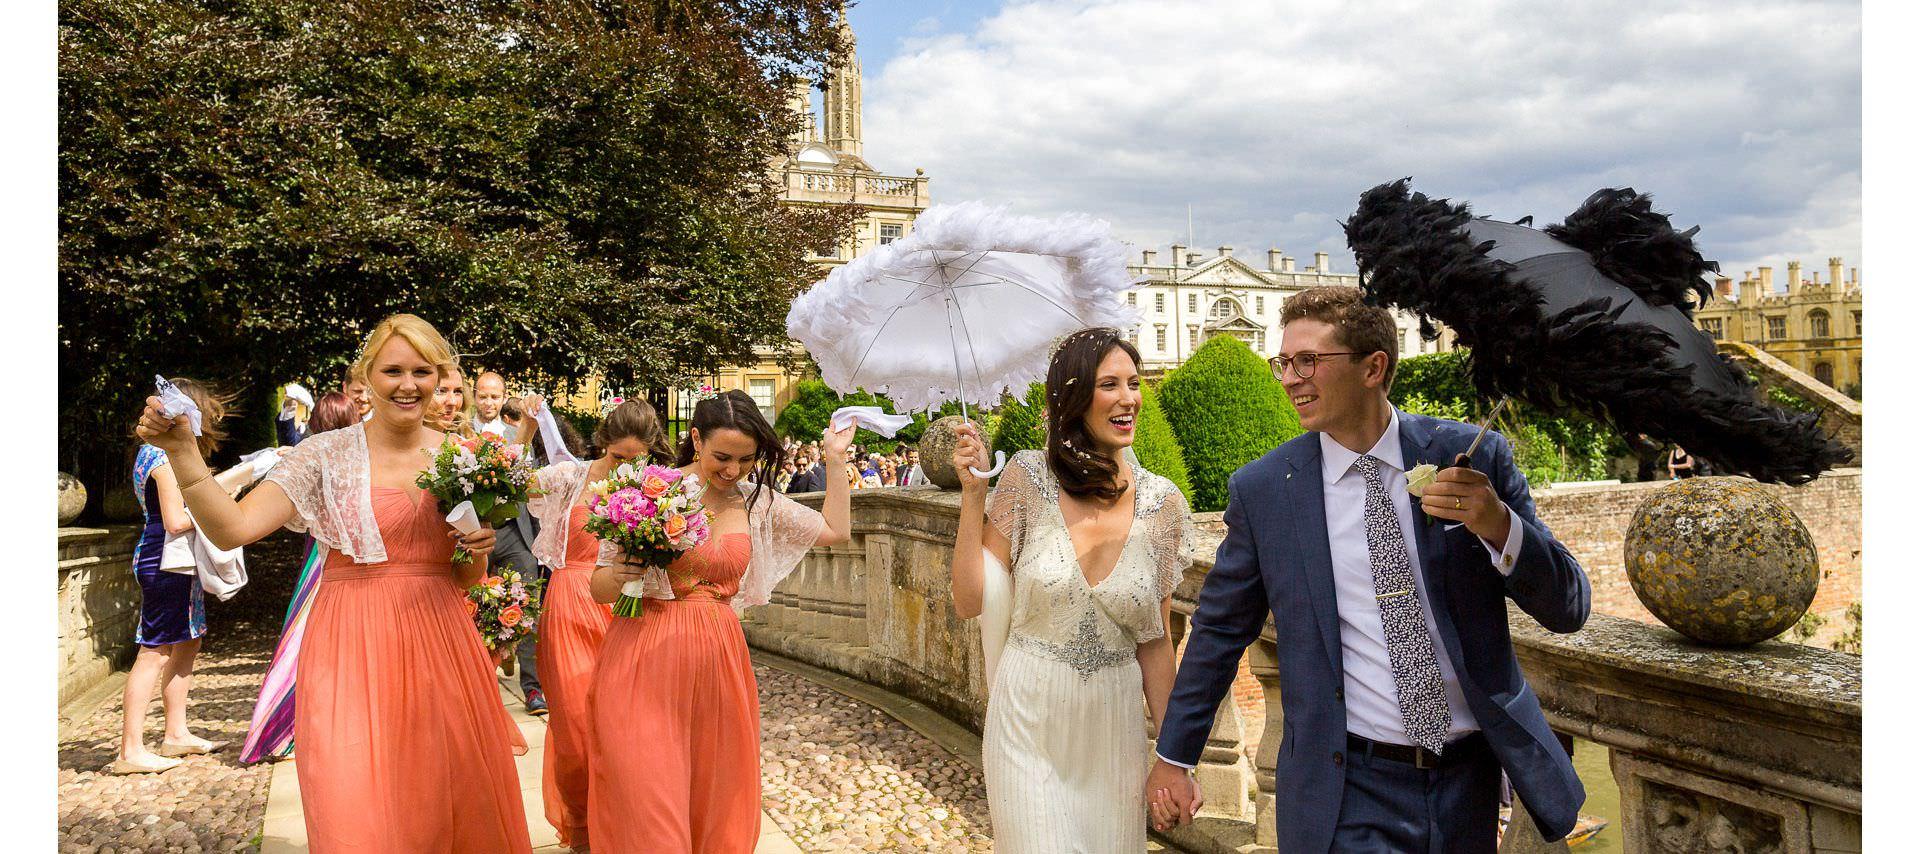 Wedding-Photography-London-01